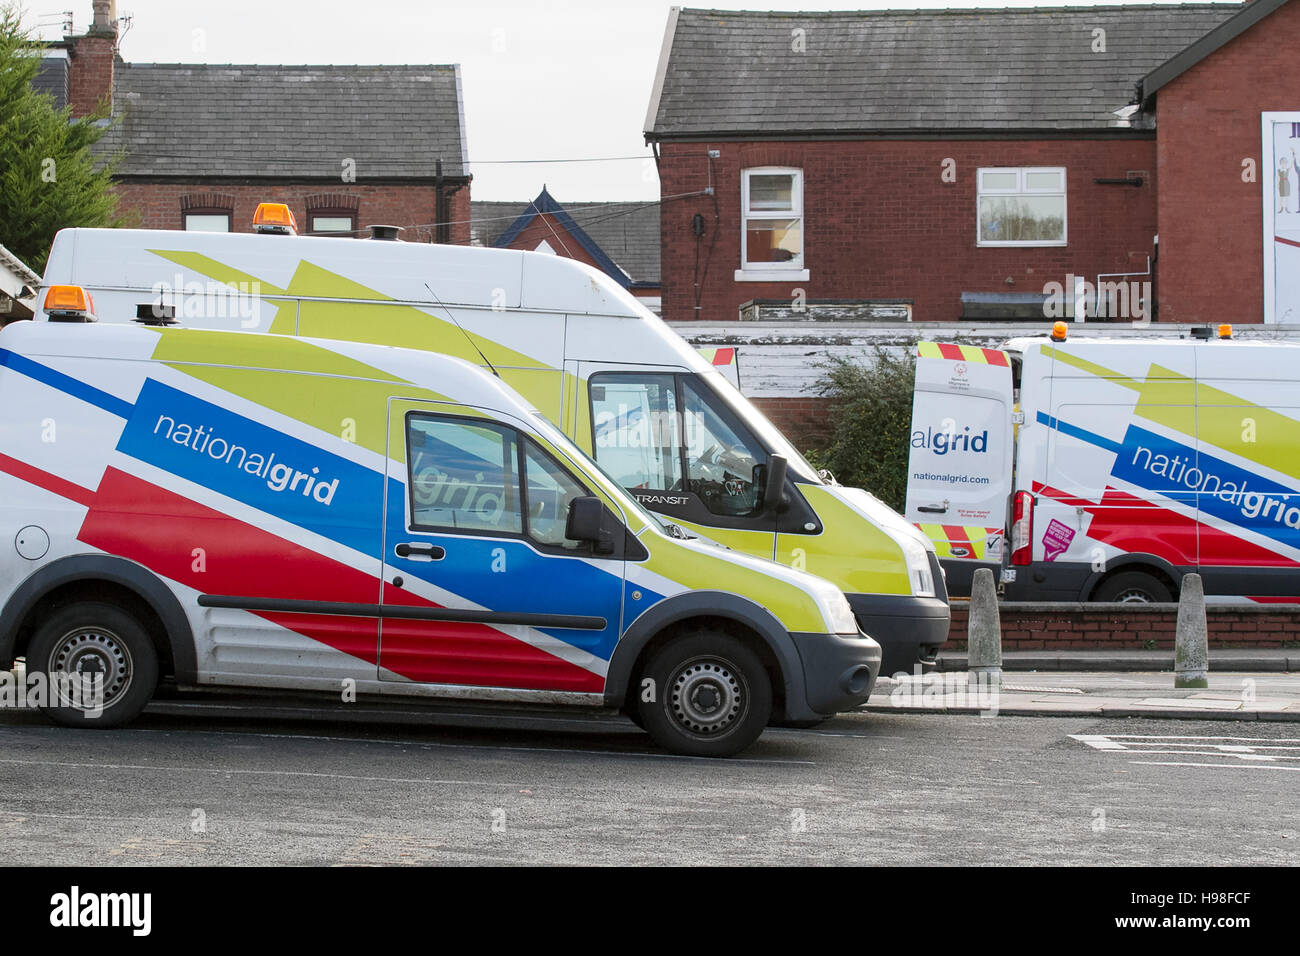 6b496e9ff355 National Grid vans attending to emergency gas leak